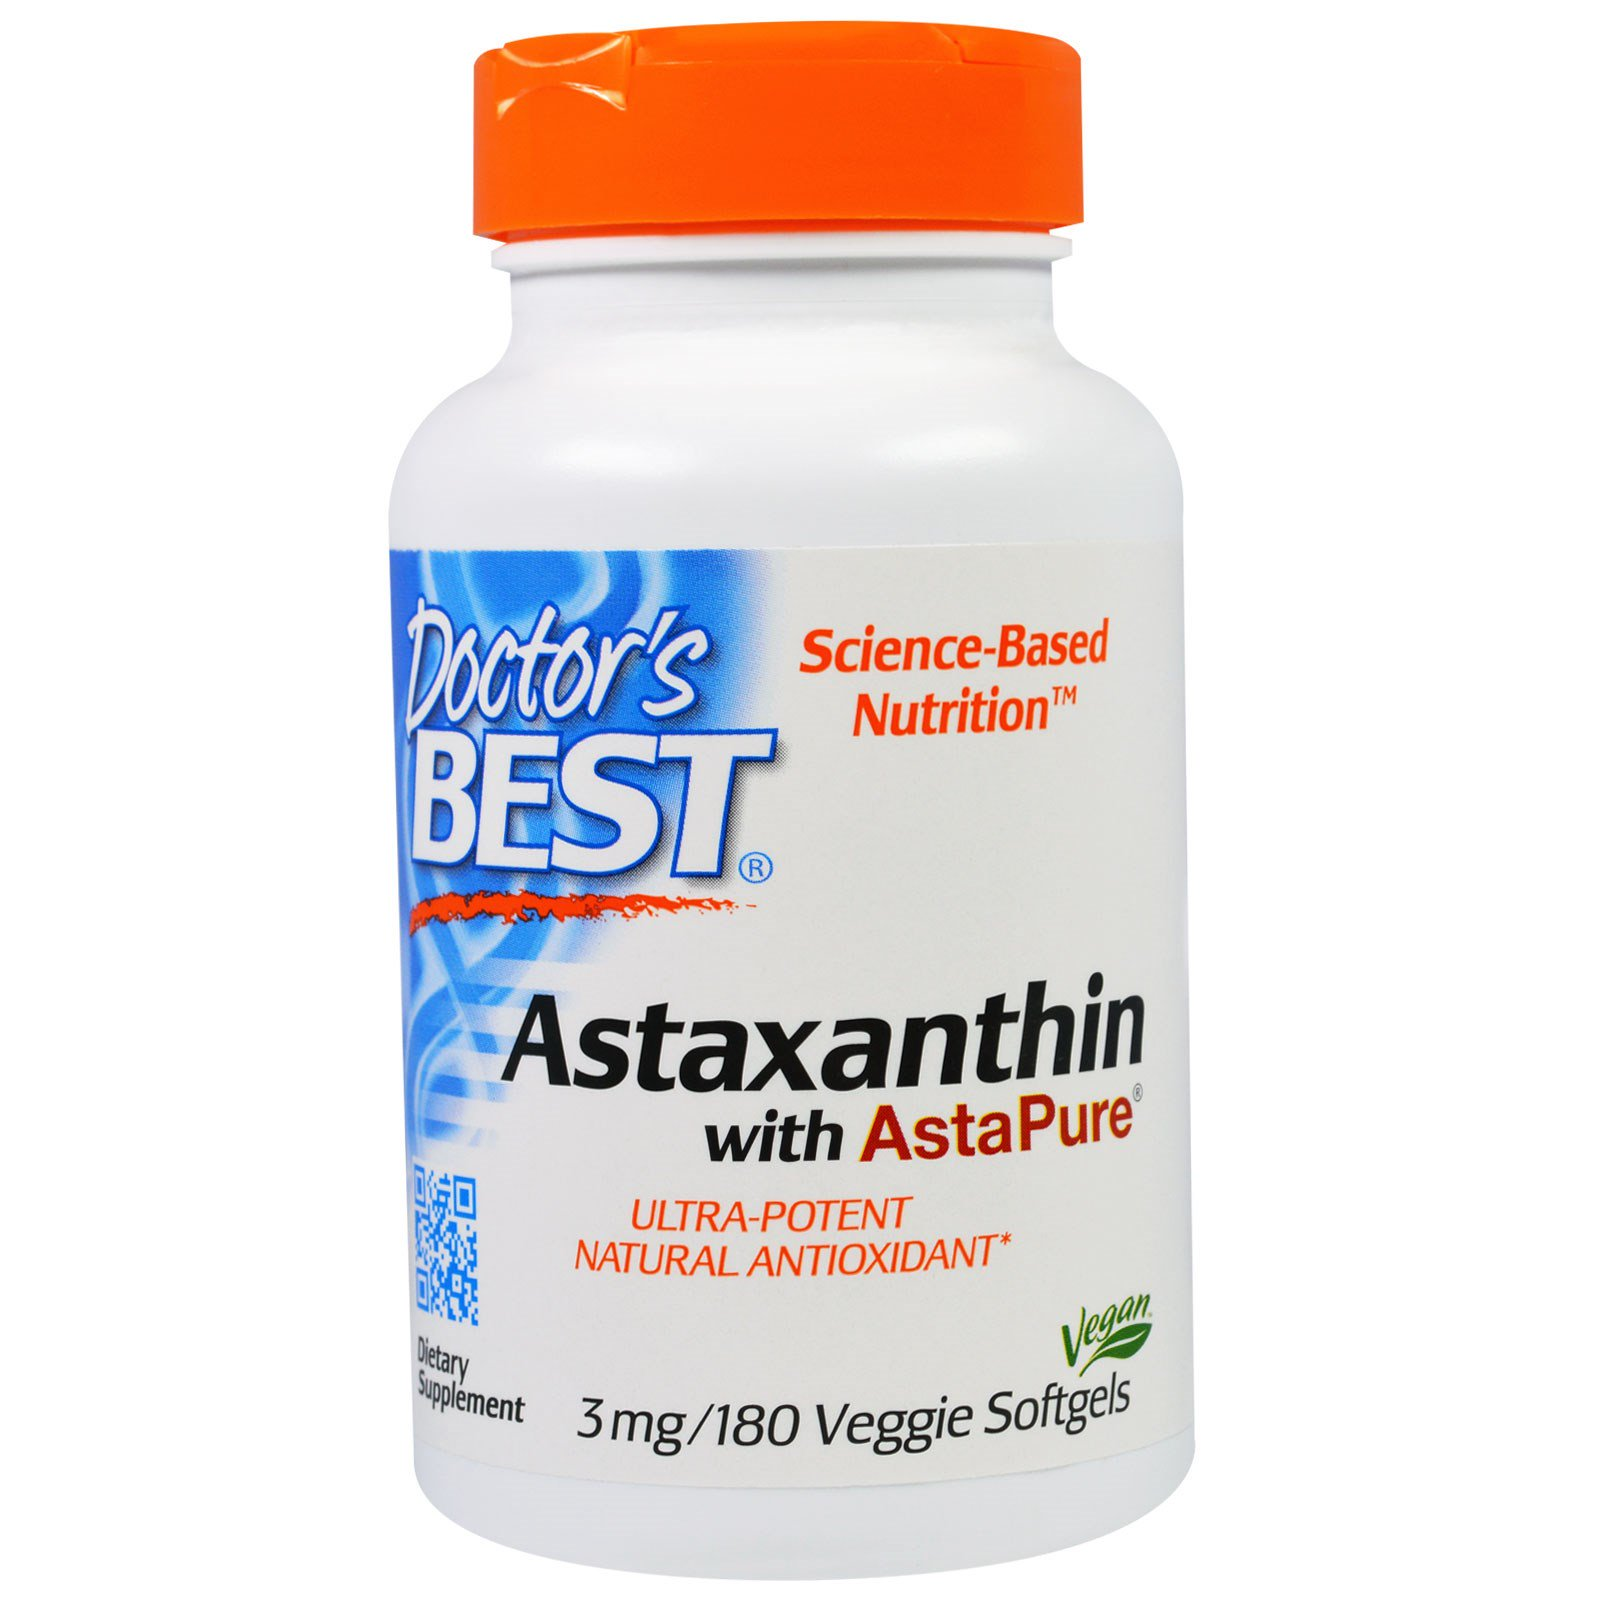 Doctor's Best, Астаксантин с AstaPure, 3 мг, 180 вегетарианских мягких желатиновых капсул